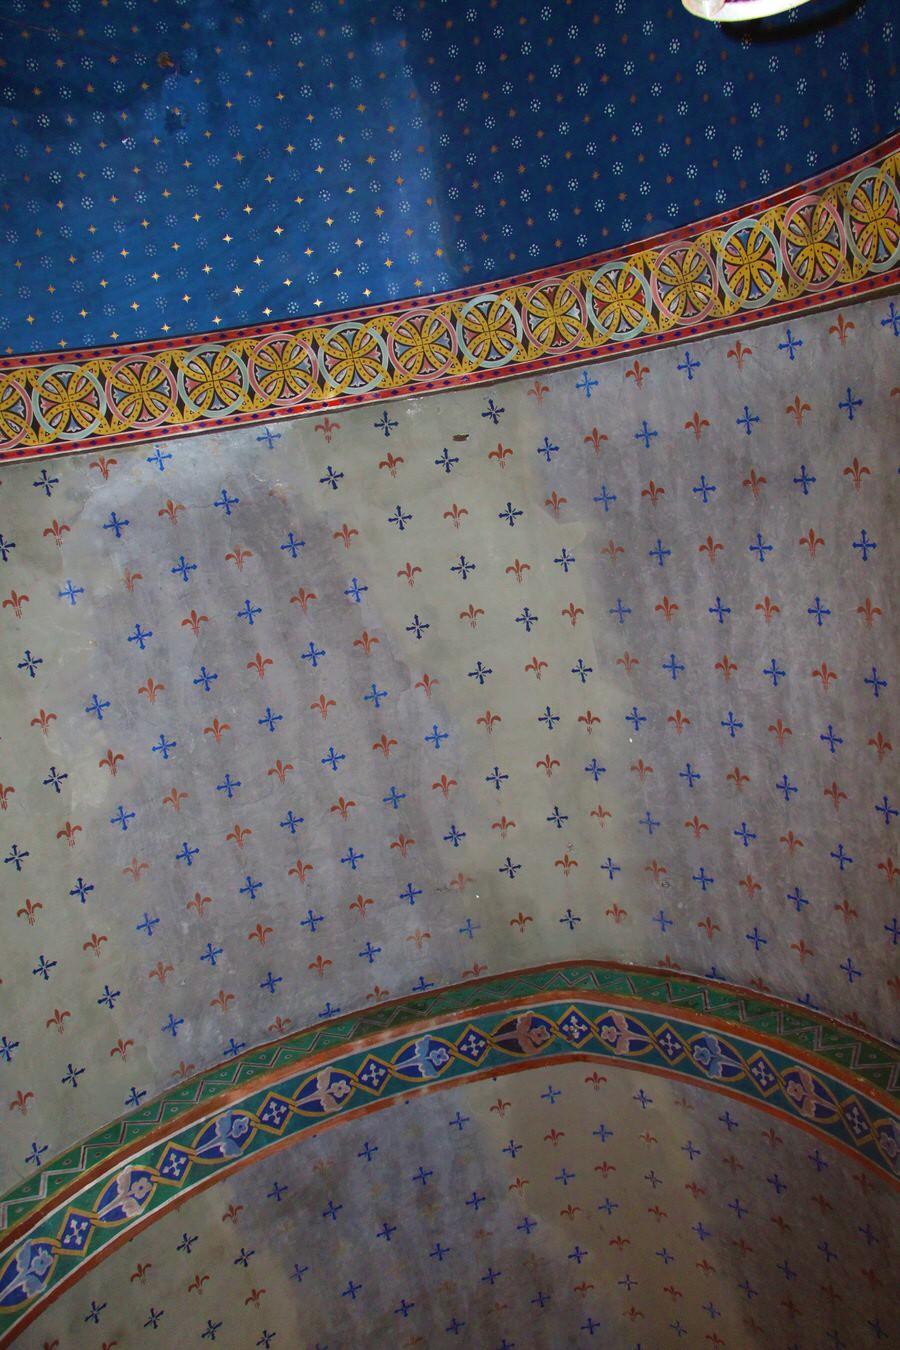 img_4497-2.jpg -Detalle pintura del techo.Iglesia San Cristobal, Beget-